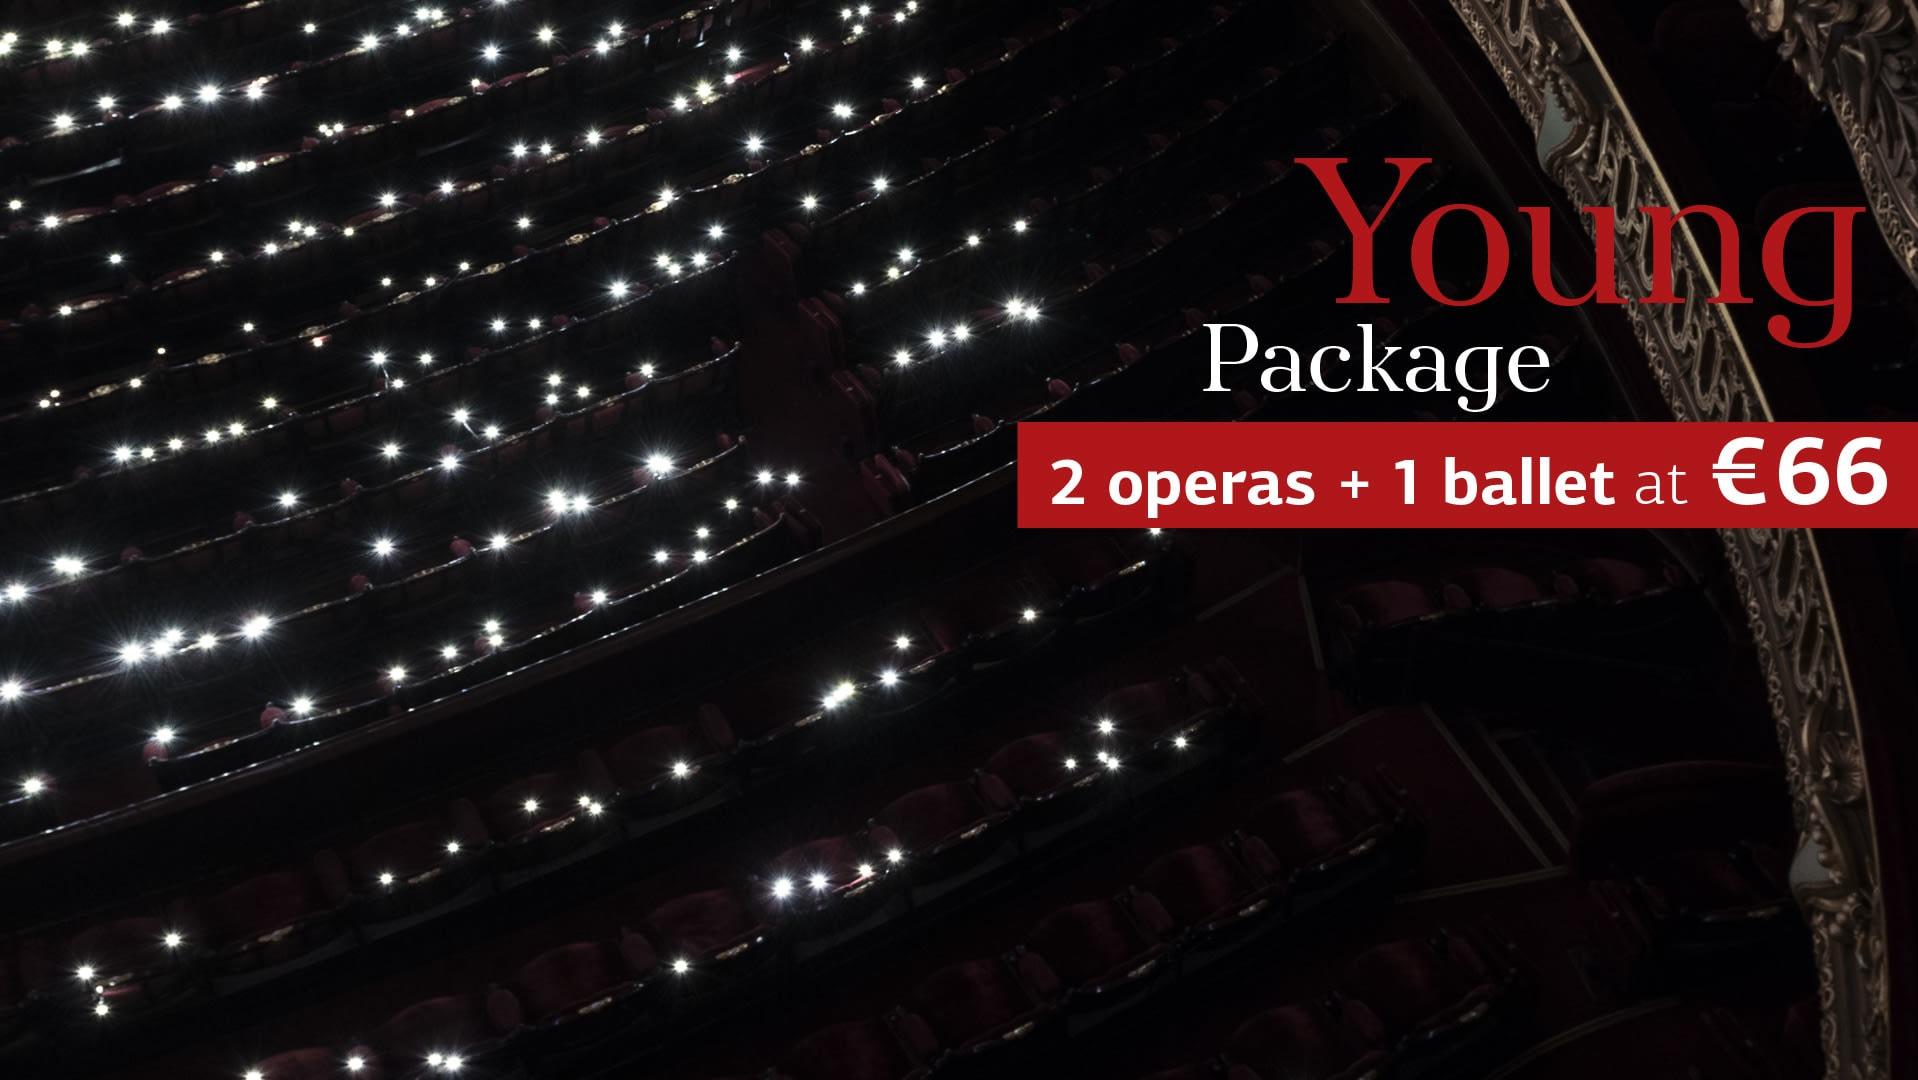 2 operas + 1 ballet for €66